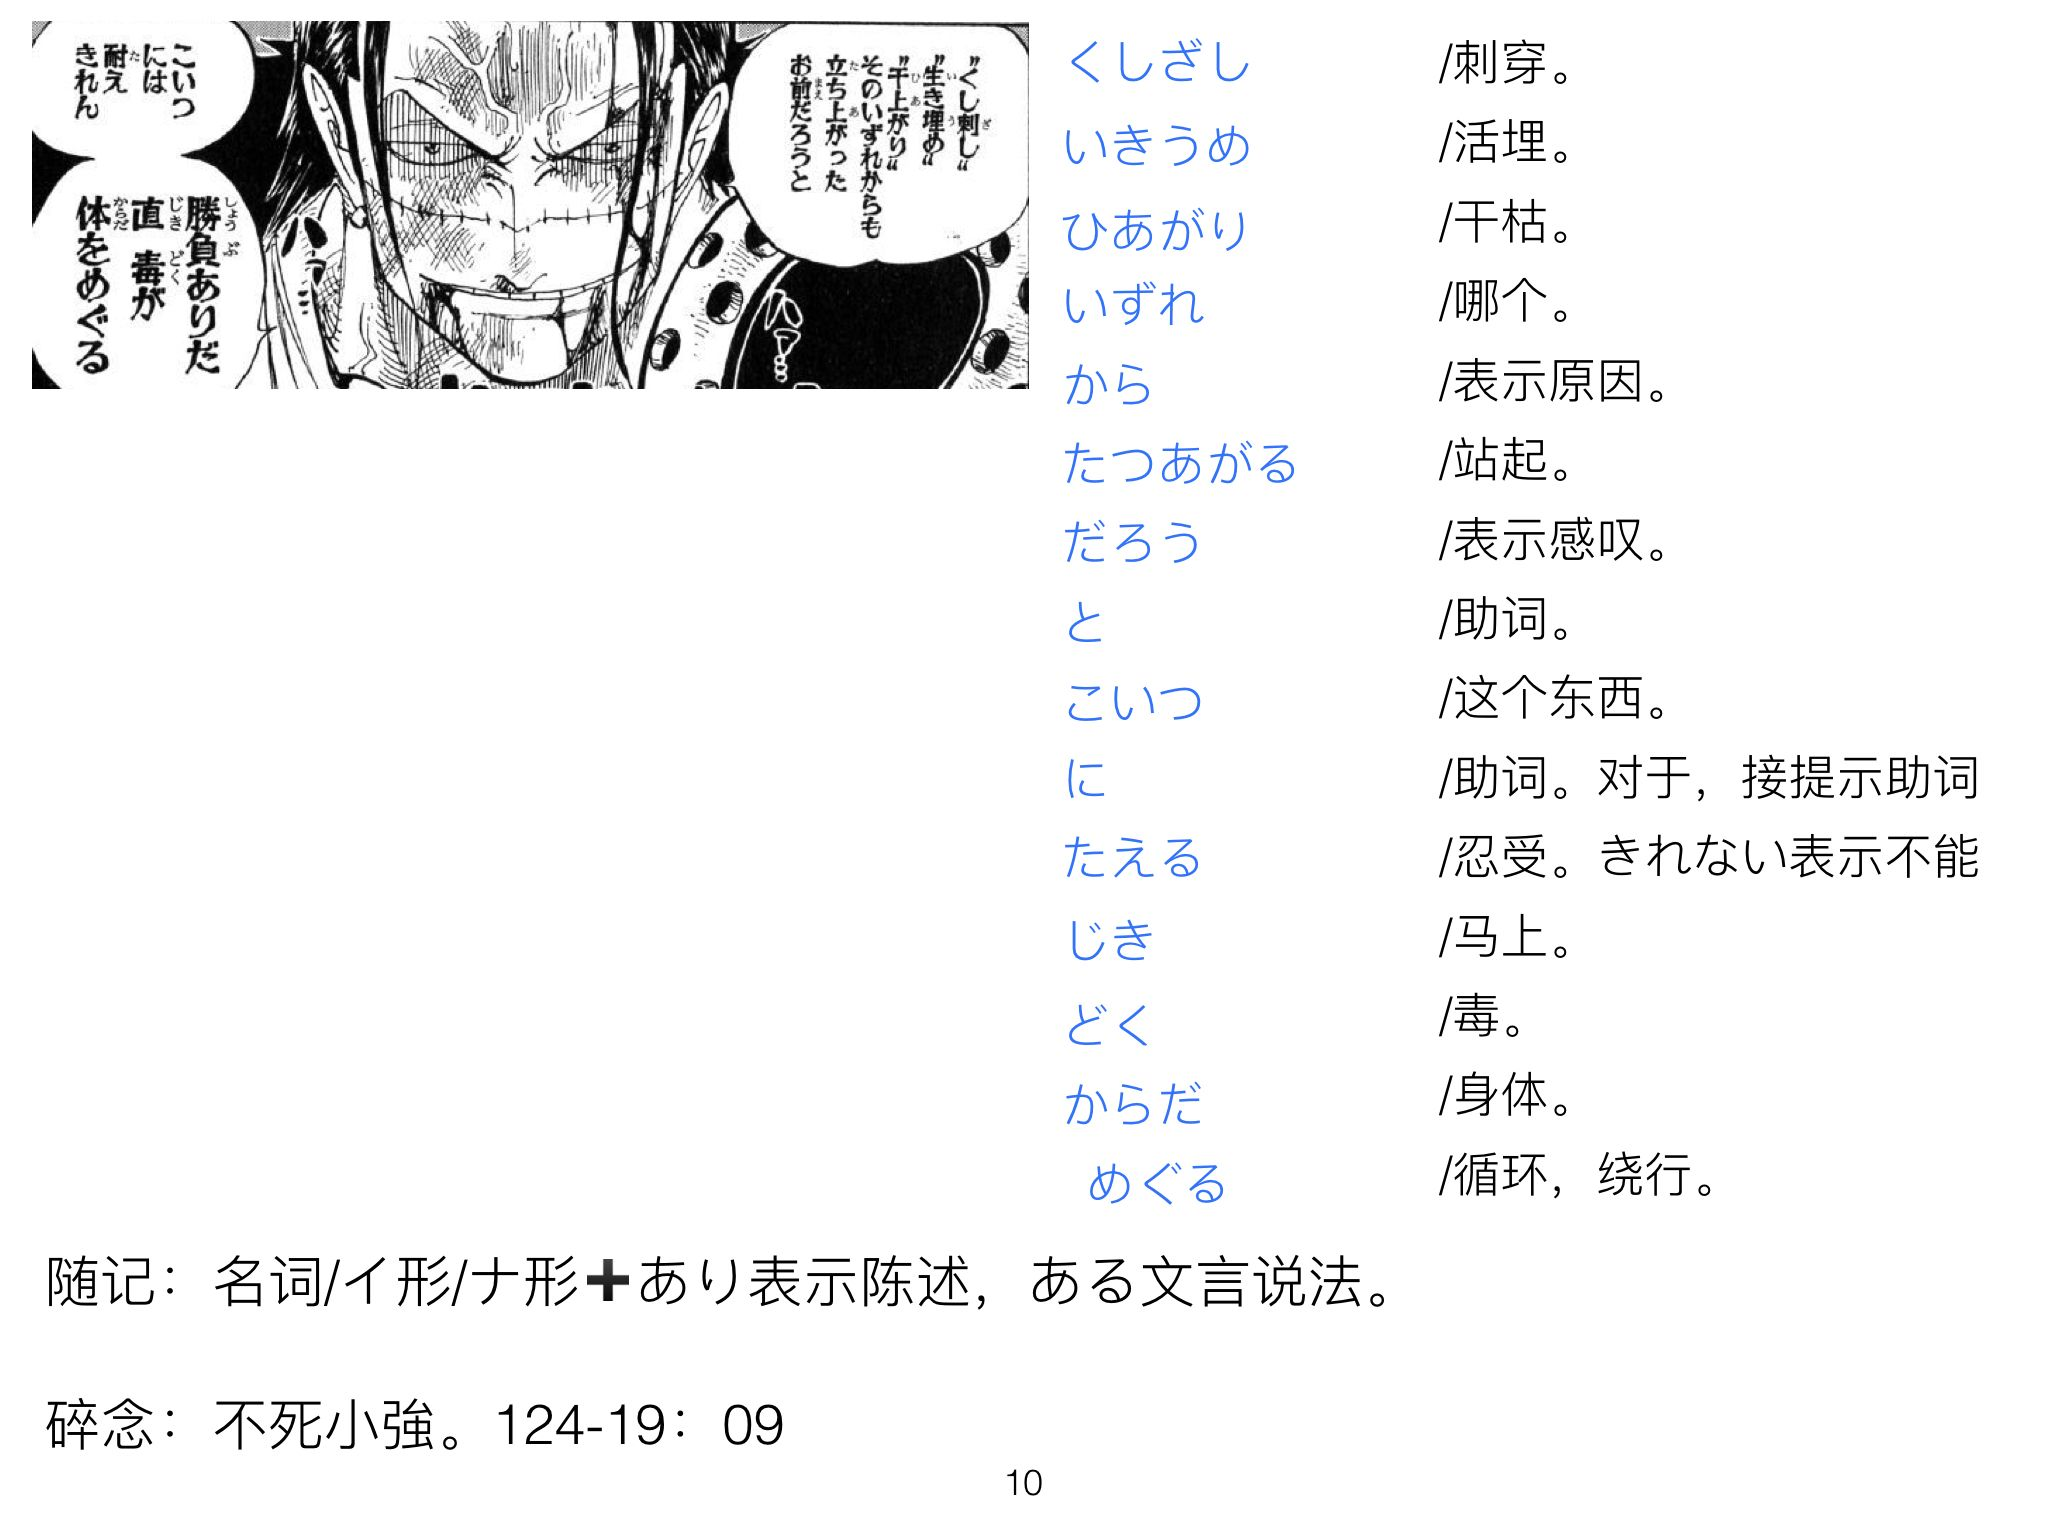 第205話 砂砂団秘密基地 reading memes chapter